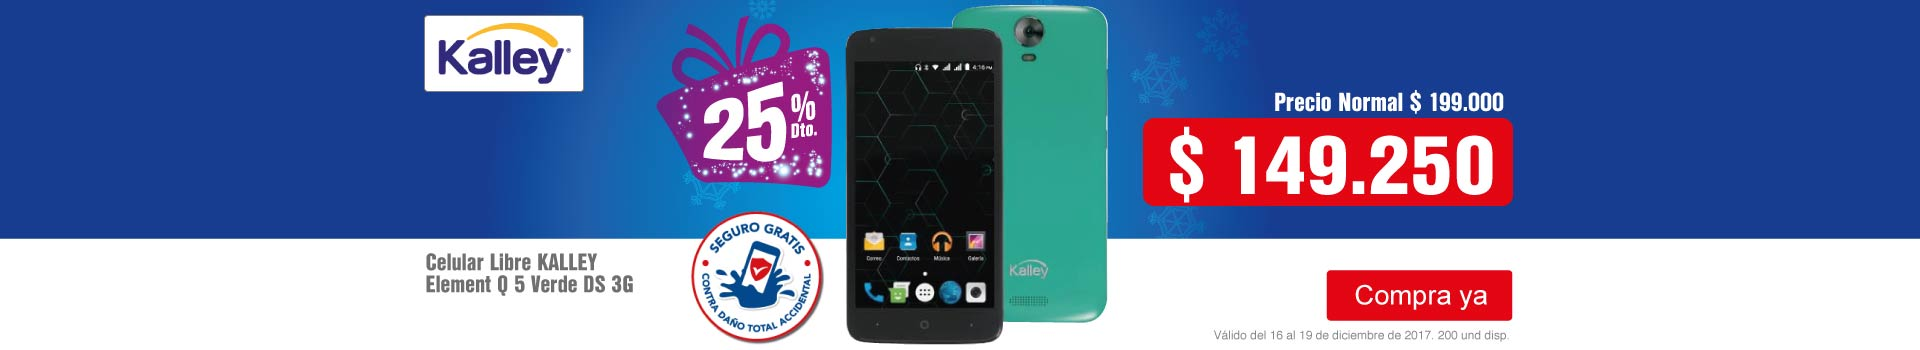 CAT KT -3-celulares-KALLEYElementQ-prod-diciembre-16-19